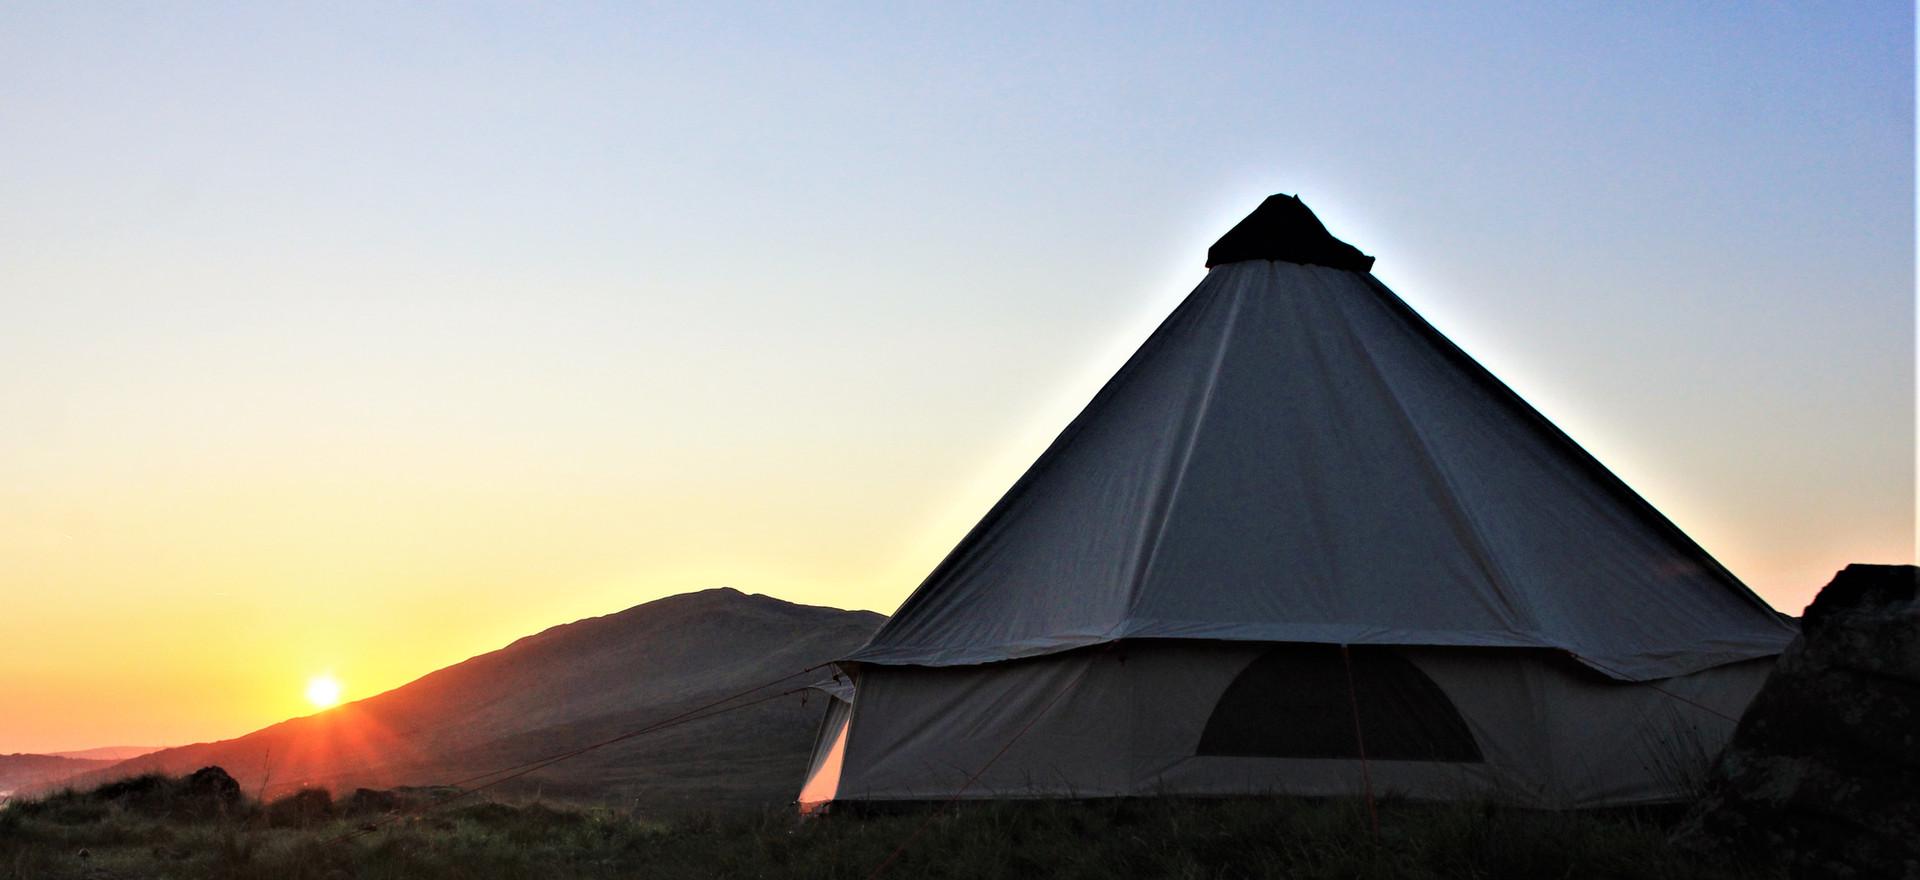 Mission_Snowdonia_Teepee_Wild_Camping_Snowdon